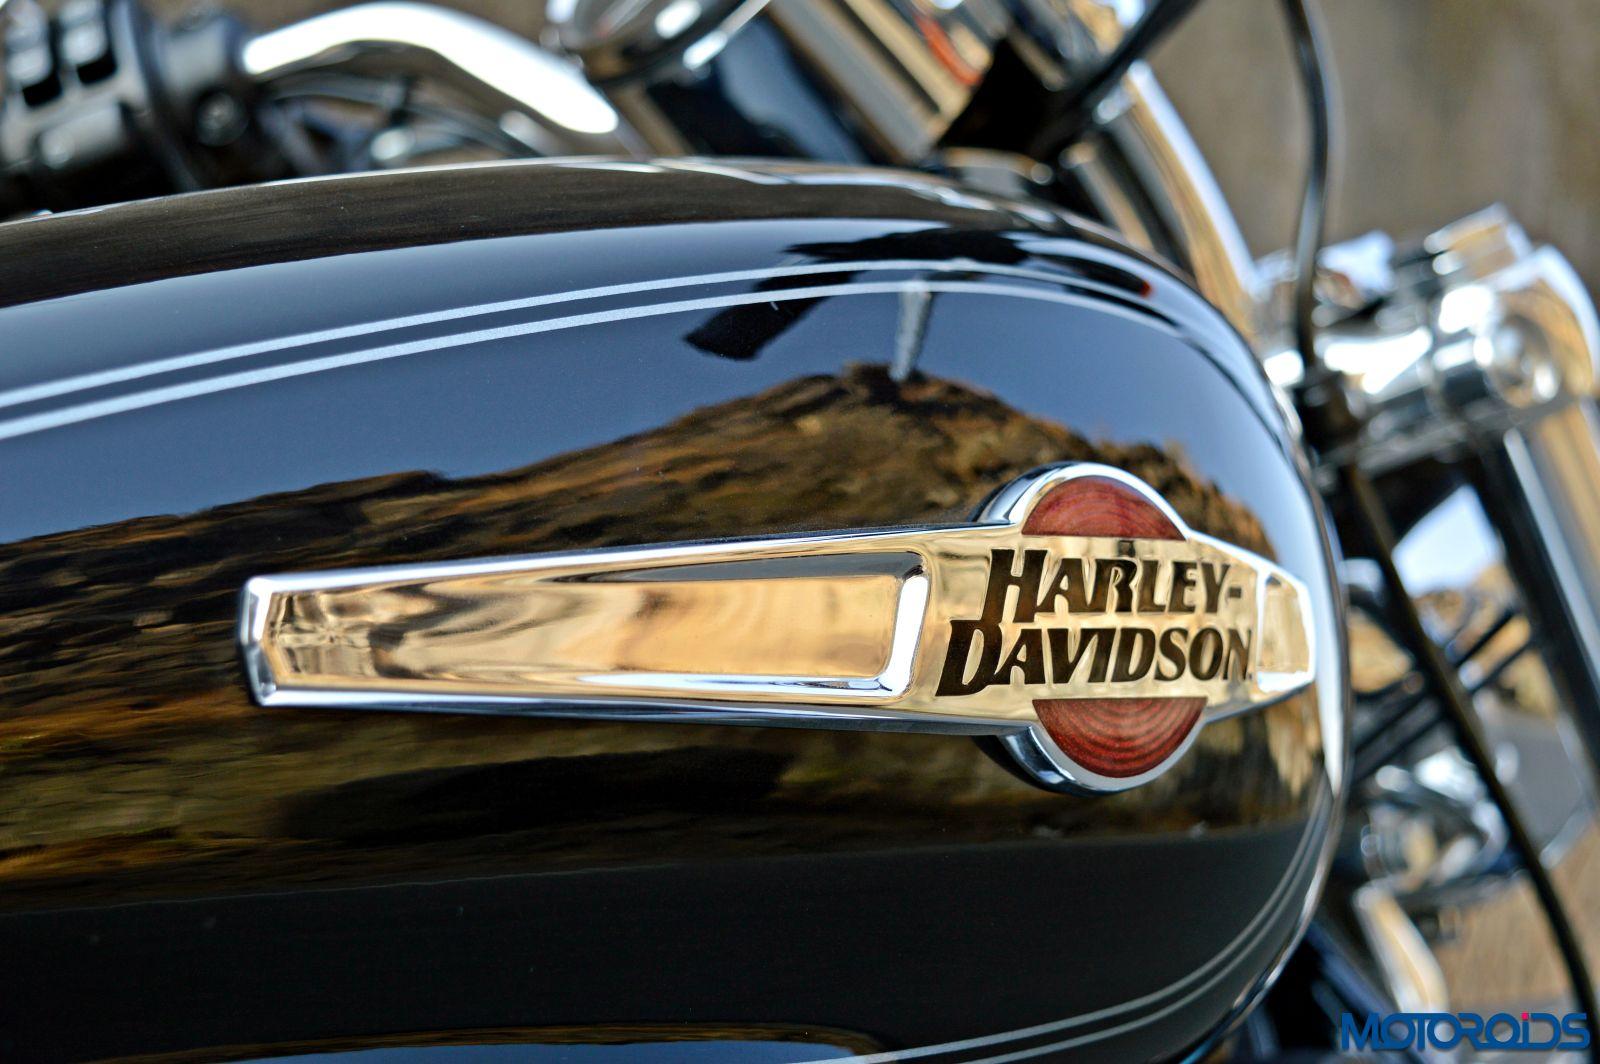 Harley-Davidson 1200 Custom Review - Details - Fuel Tank (1)